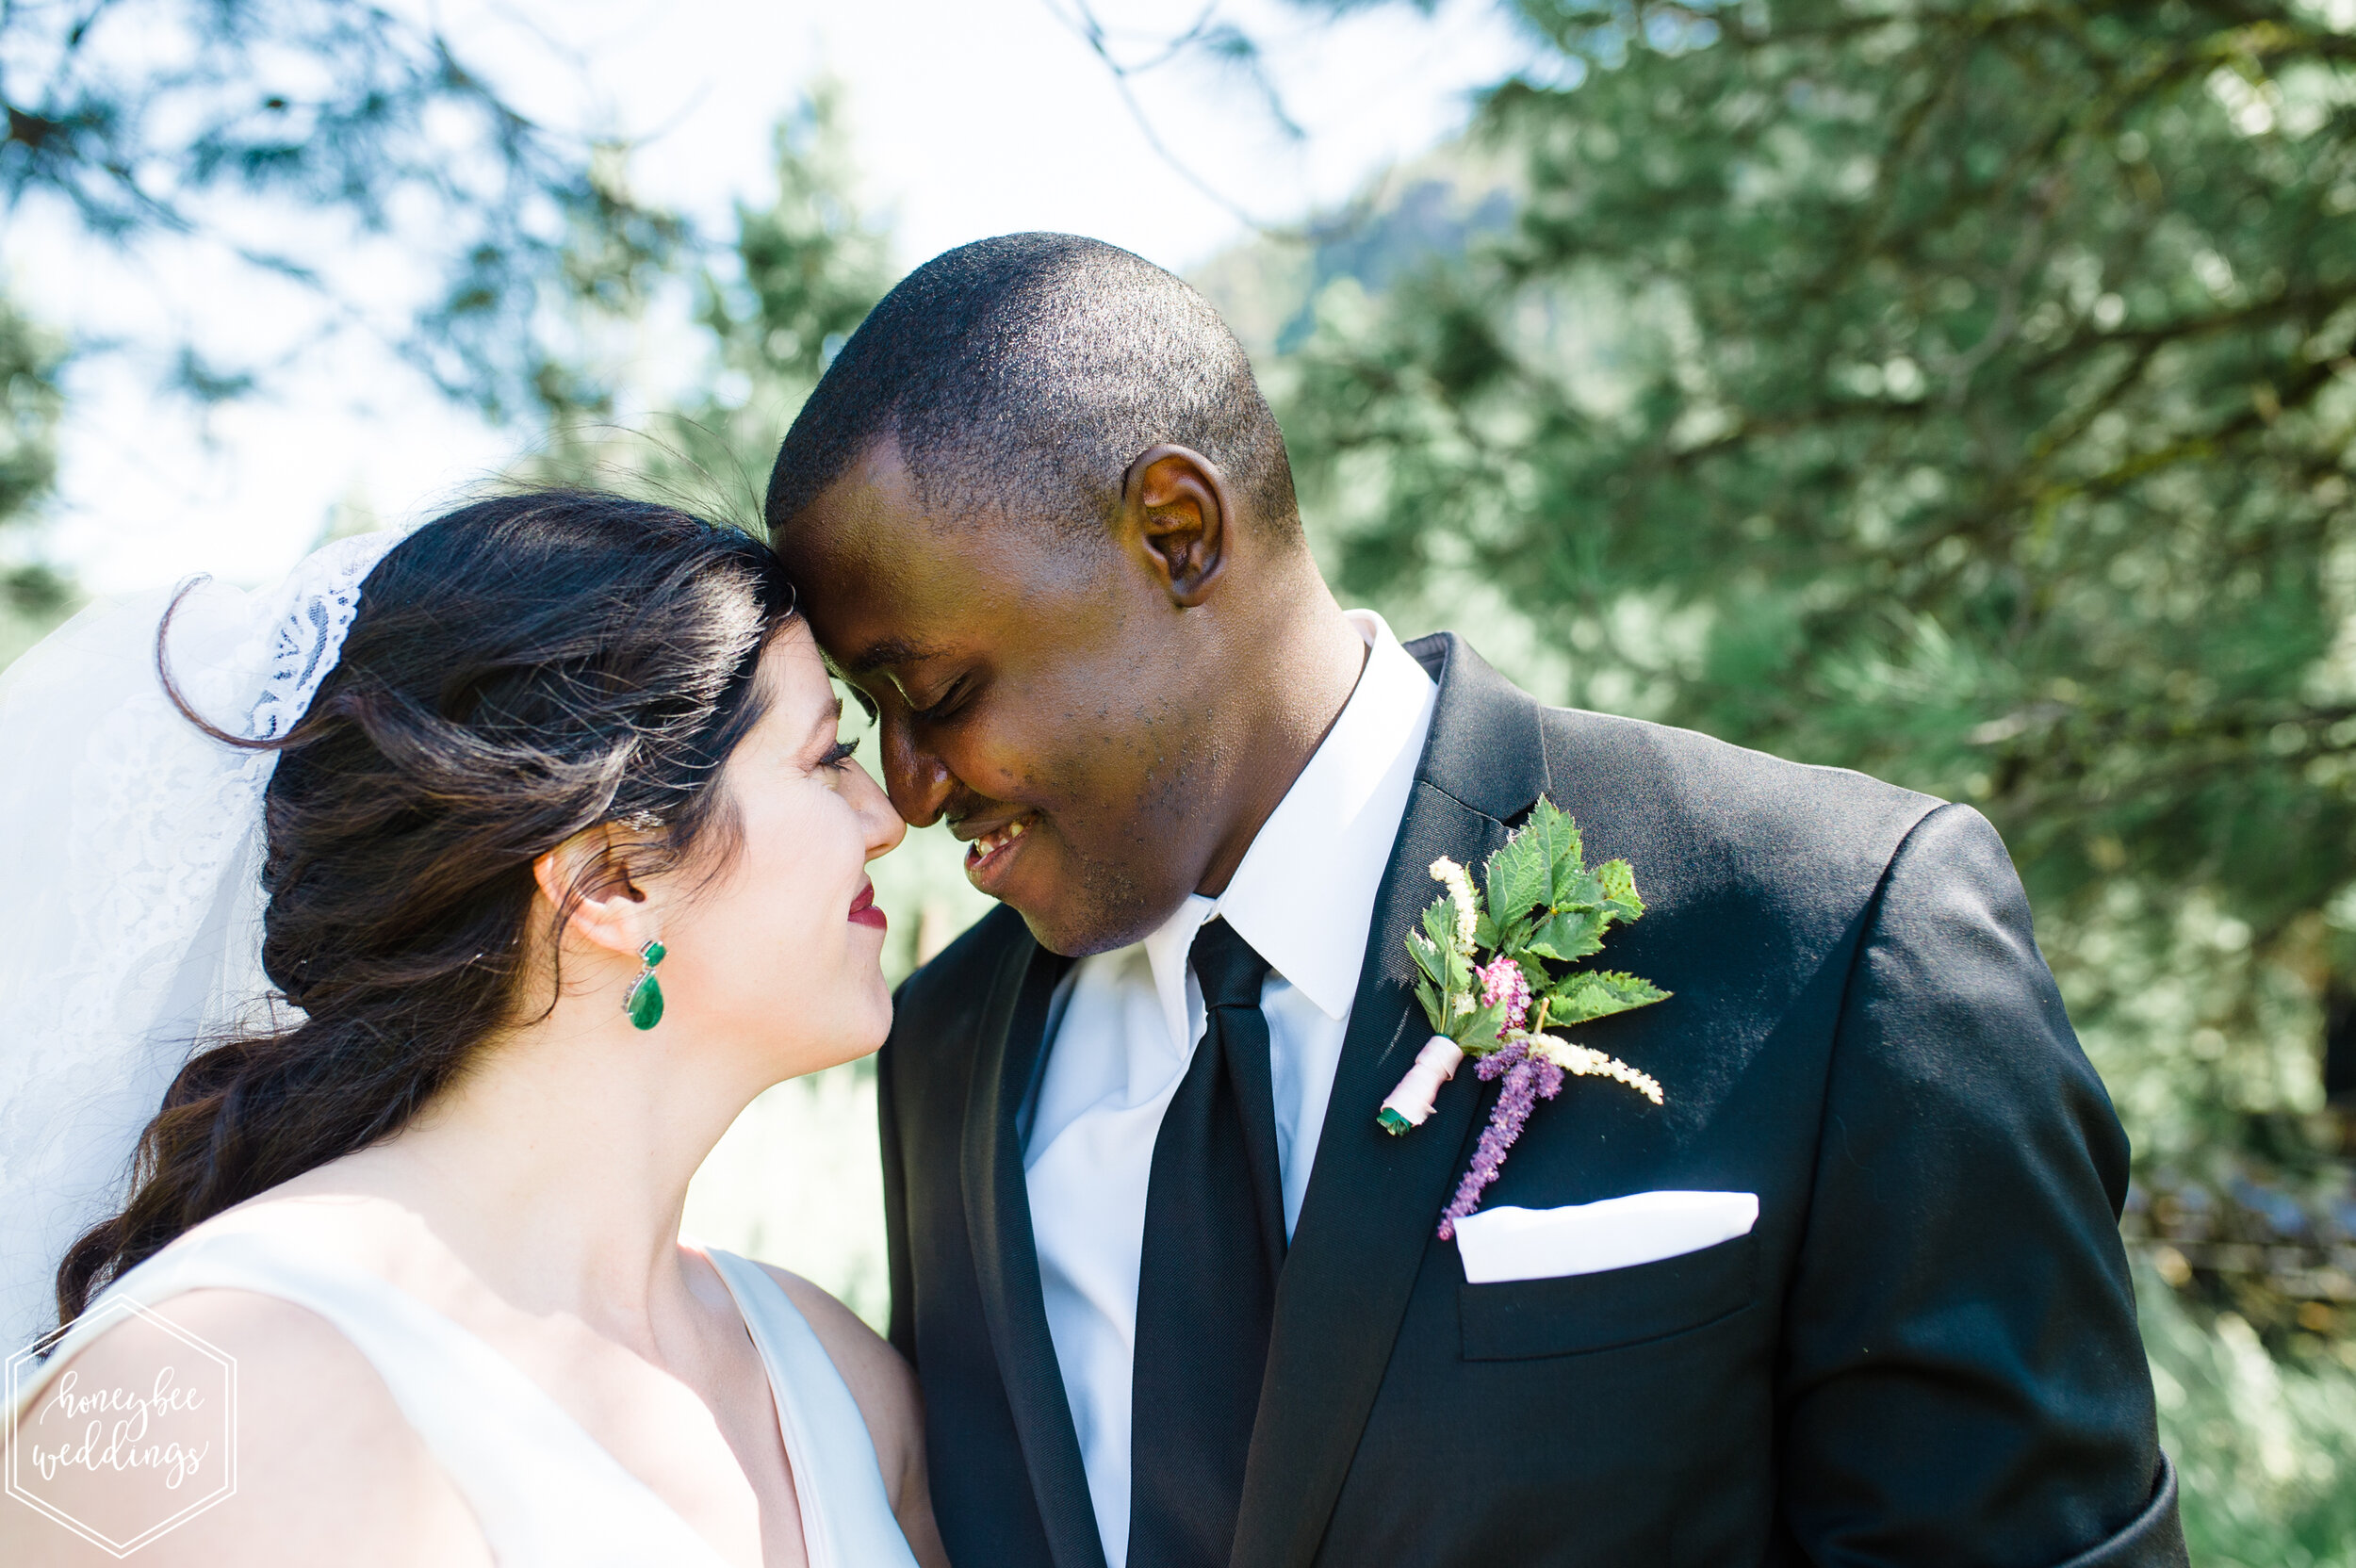 074White Raven Wedding_Montana Wedding Photographer_Rebekah & Likom_Honeybee Weddings_July 27, 2019-2185.jpg